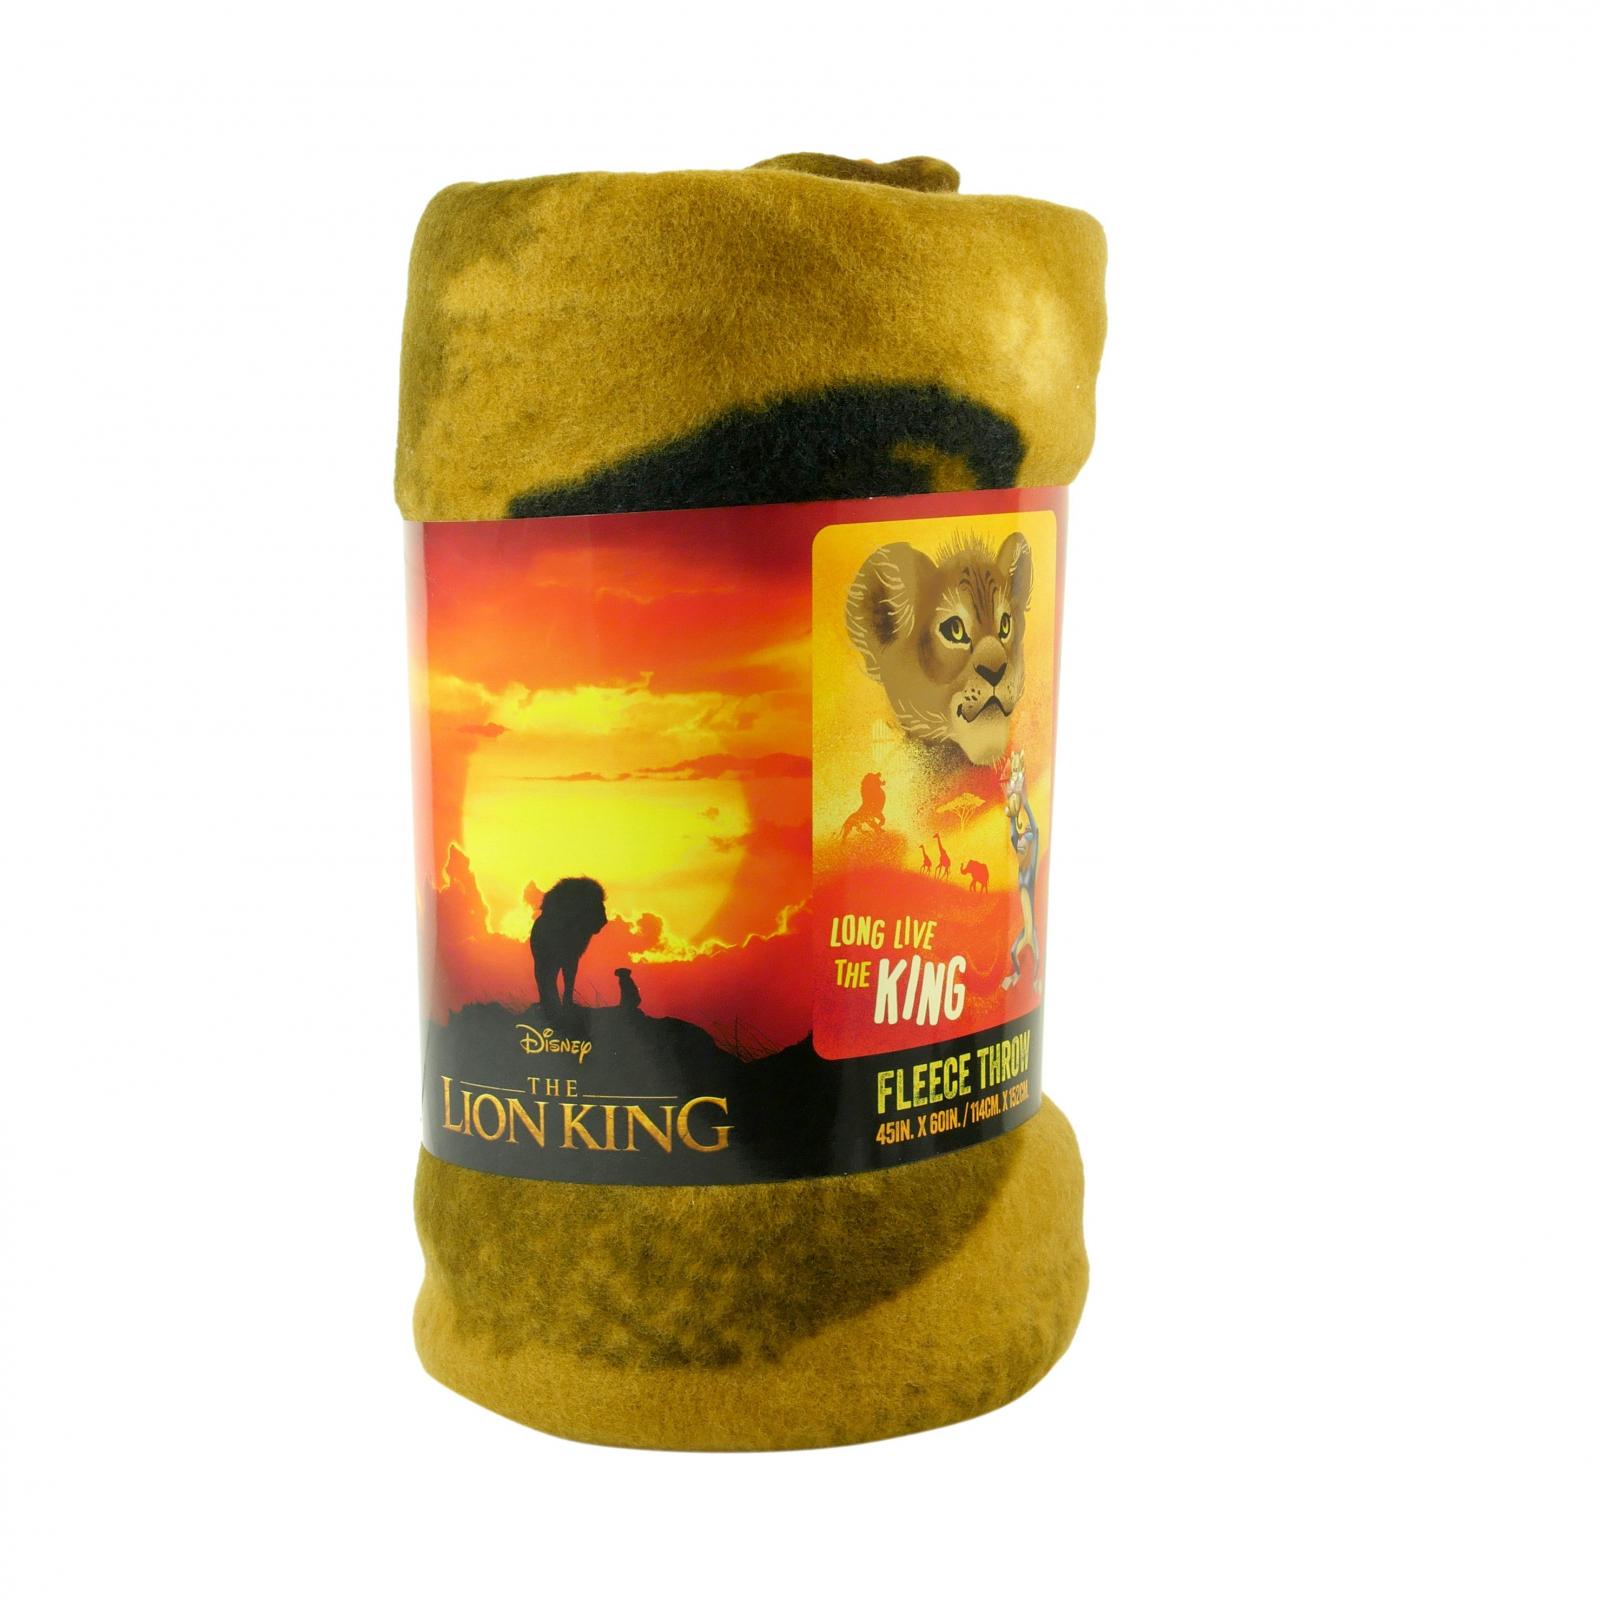 The Lion King Fleece Throw Blanket 45 x 60 Inch Kids Decor